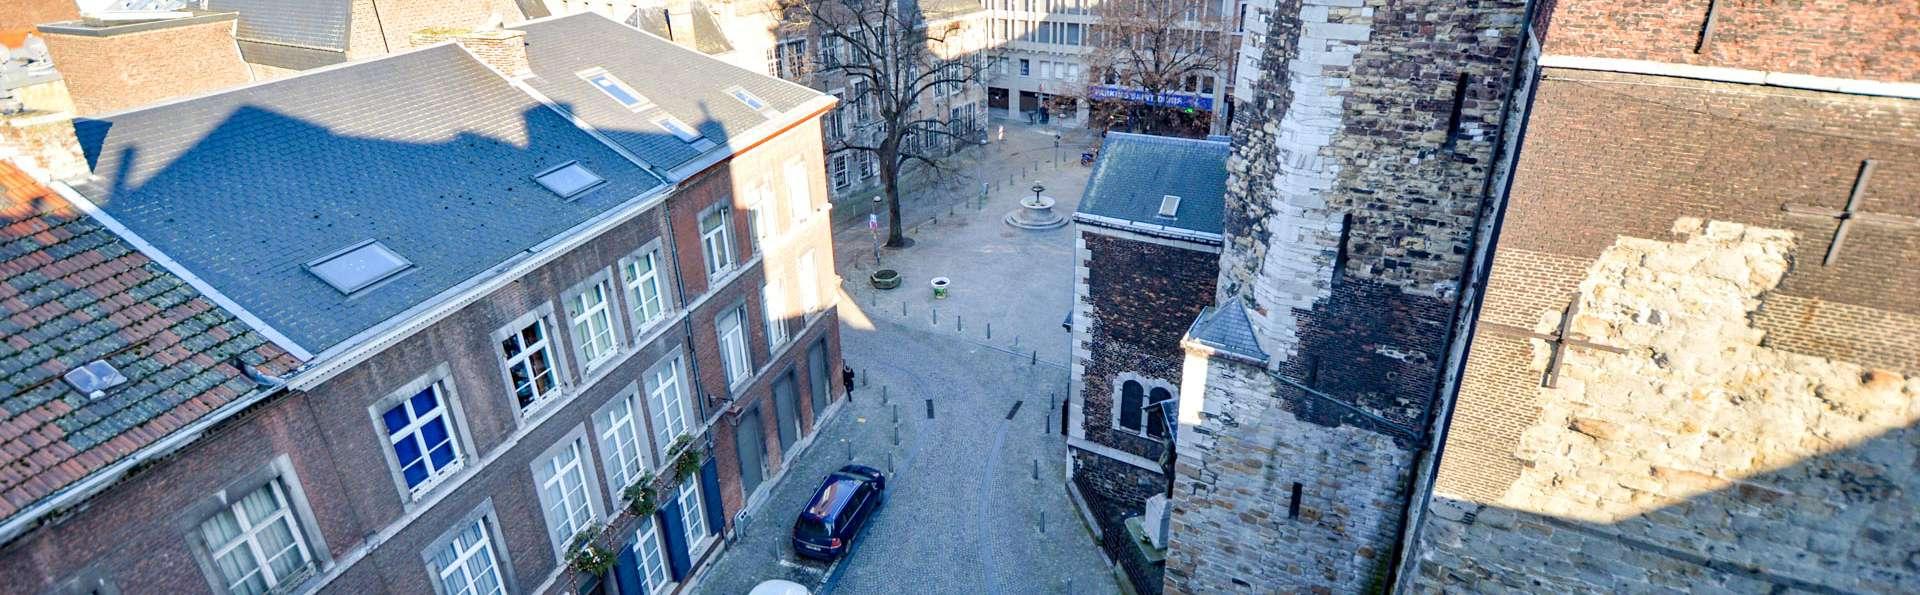 Escapade au coeur de Liège